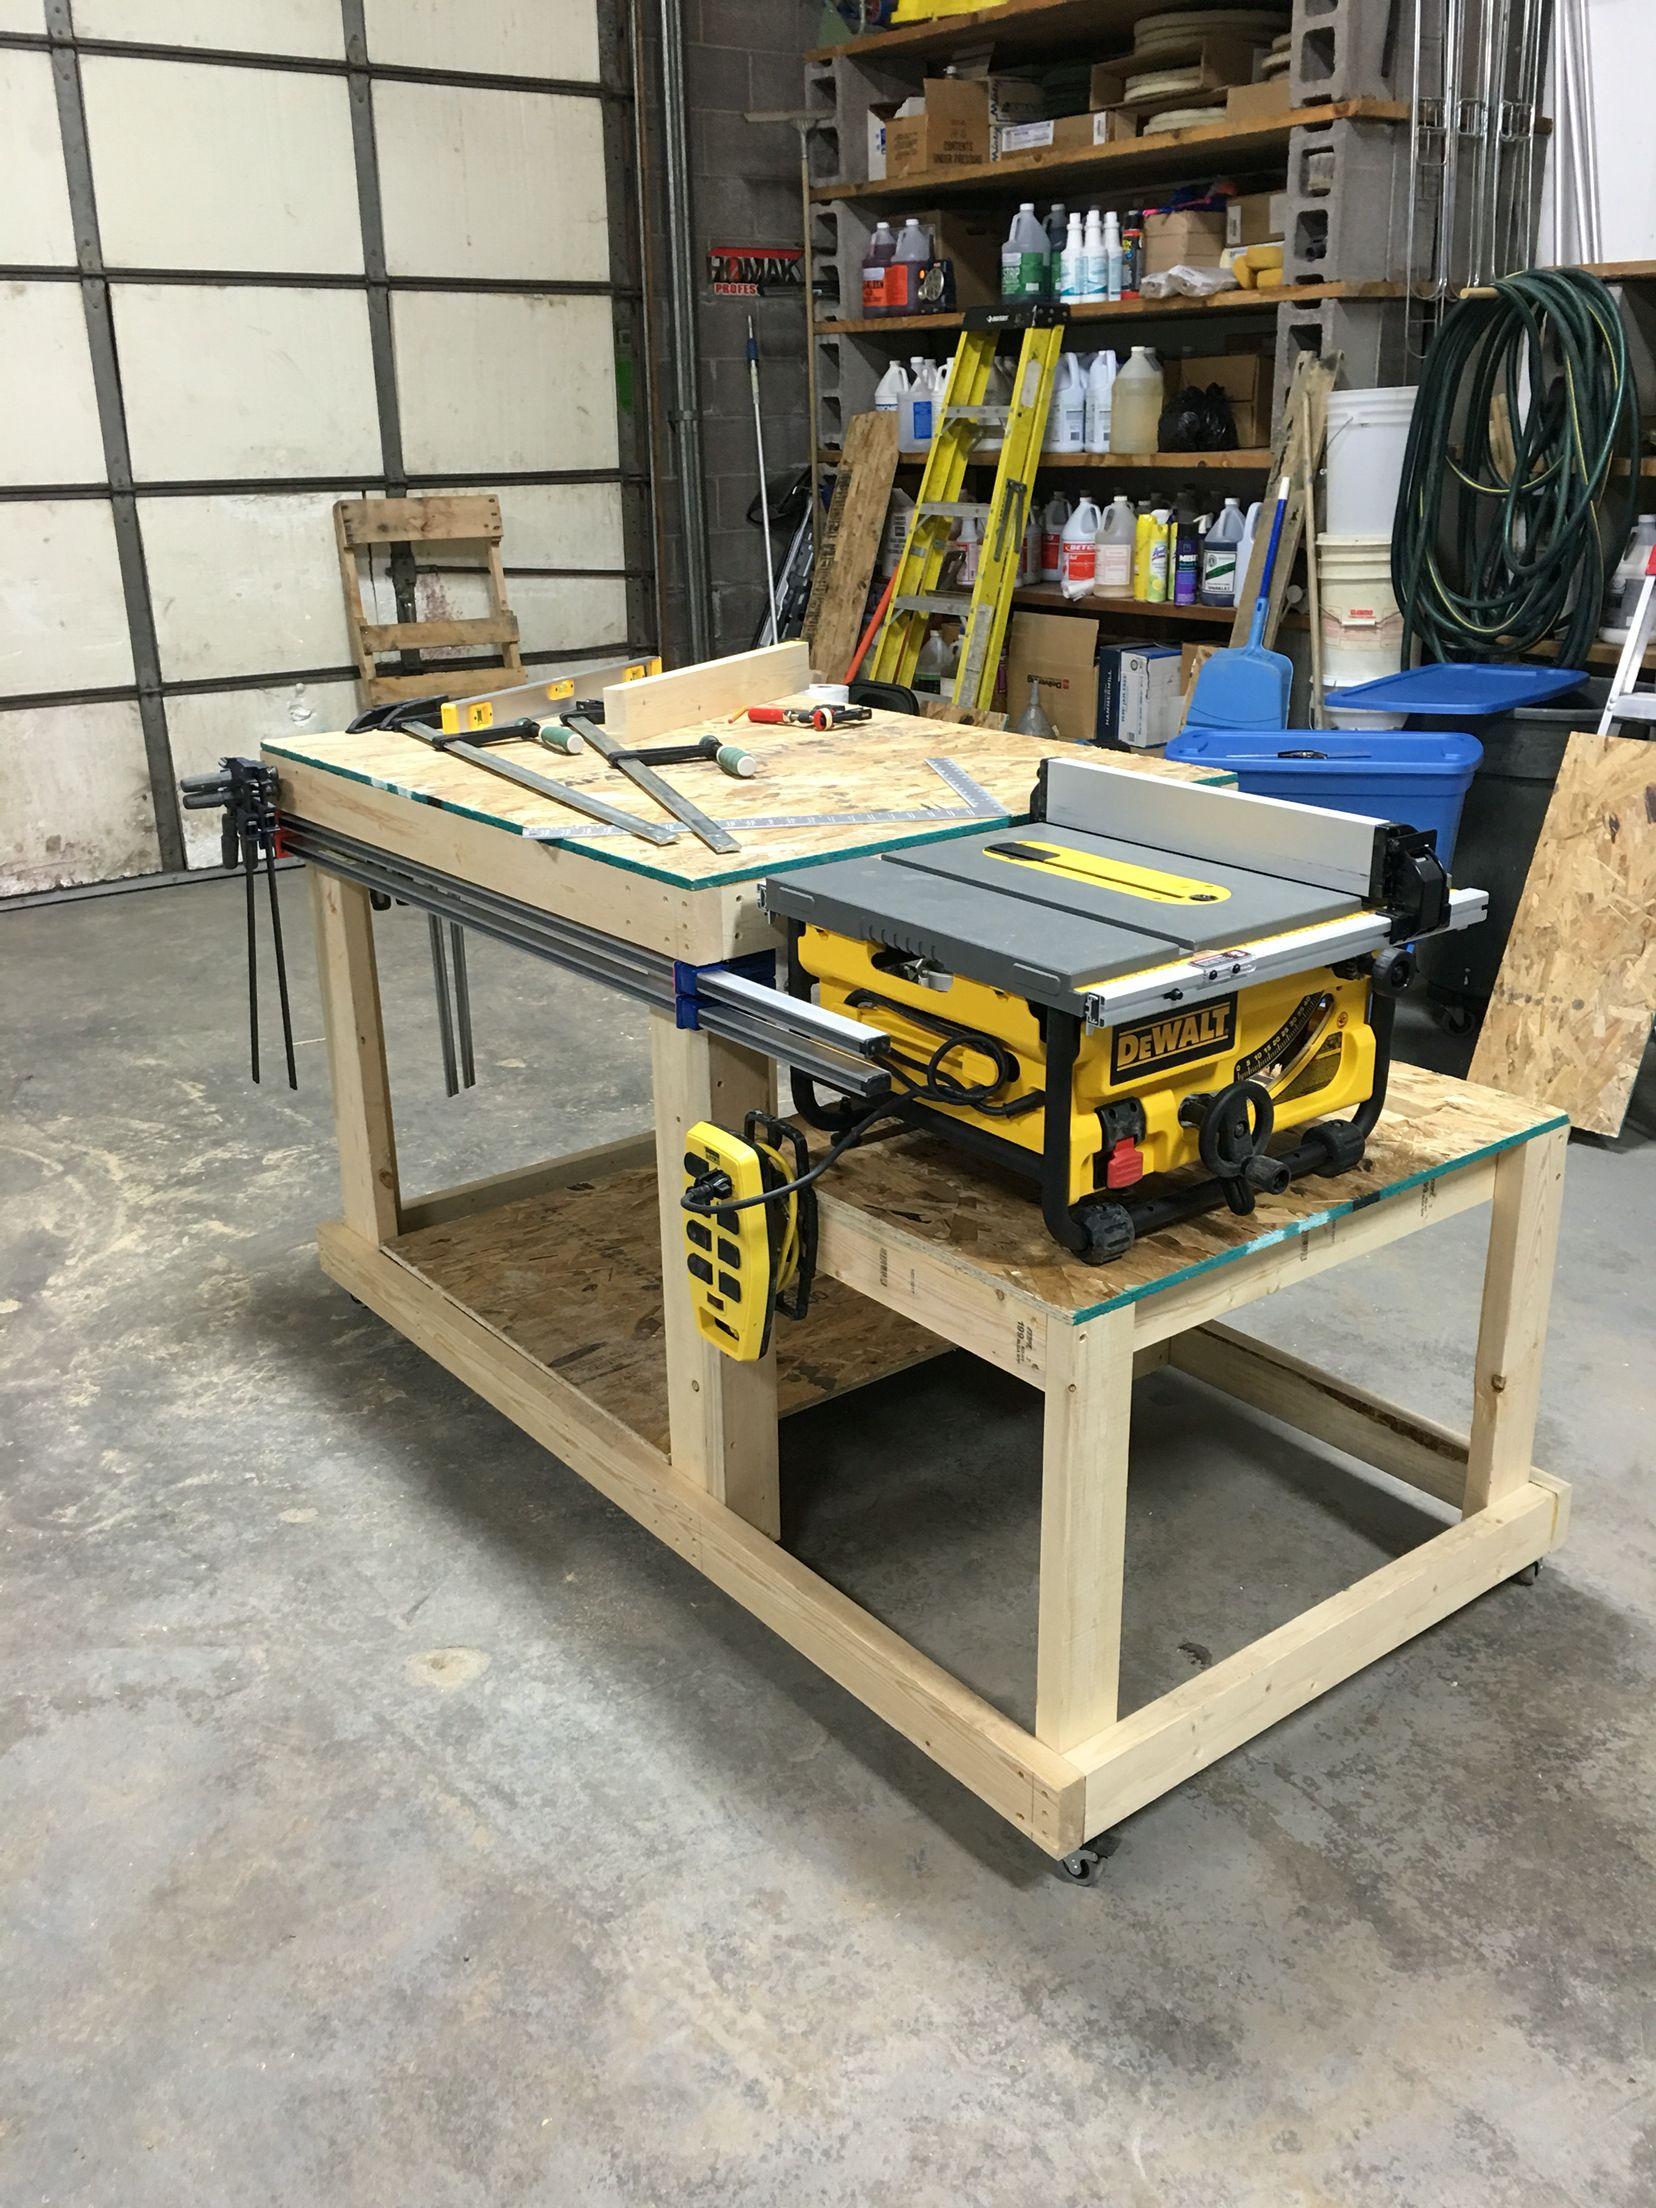 Workbench/Table Saw Bench Table saw workbench